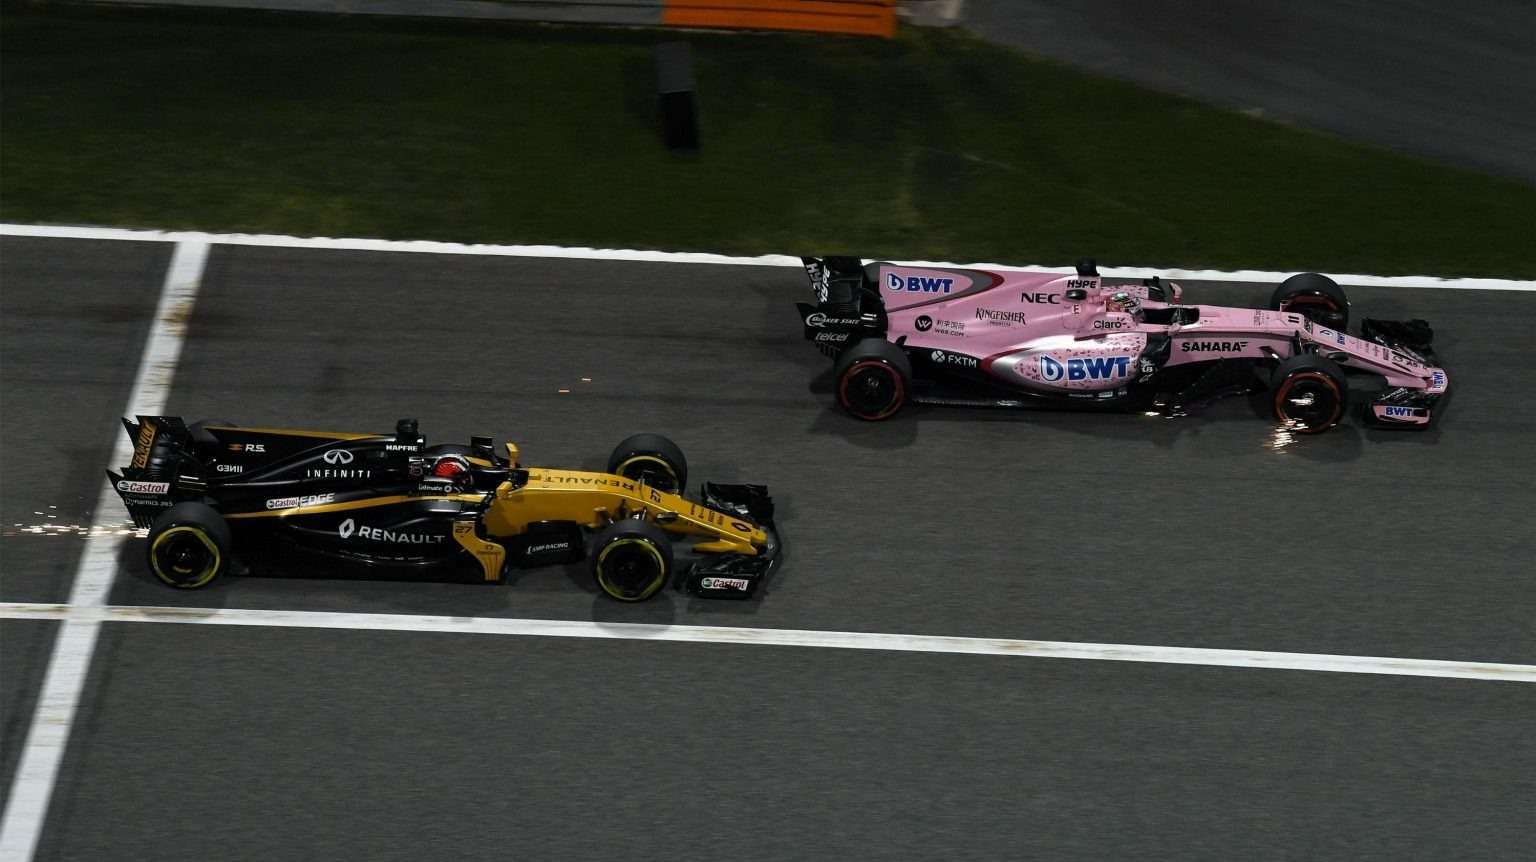 Формула 1, Гран-при Бахрейна, Себастьян Феттель, Льюис Хэмилтон, Ferrari, Mercedes